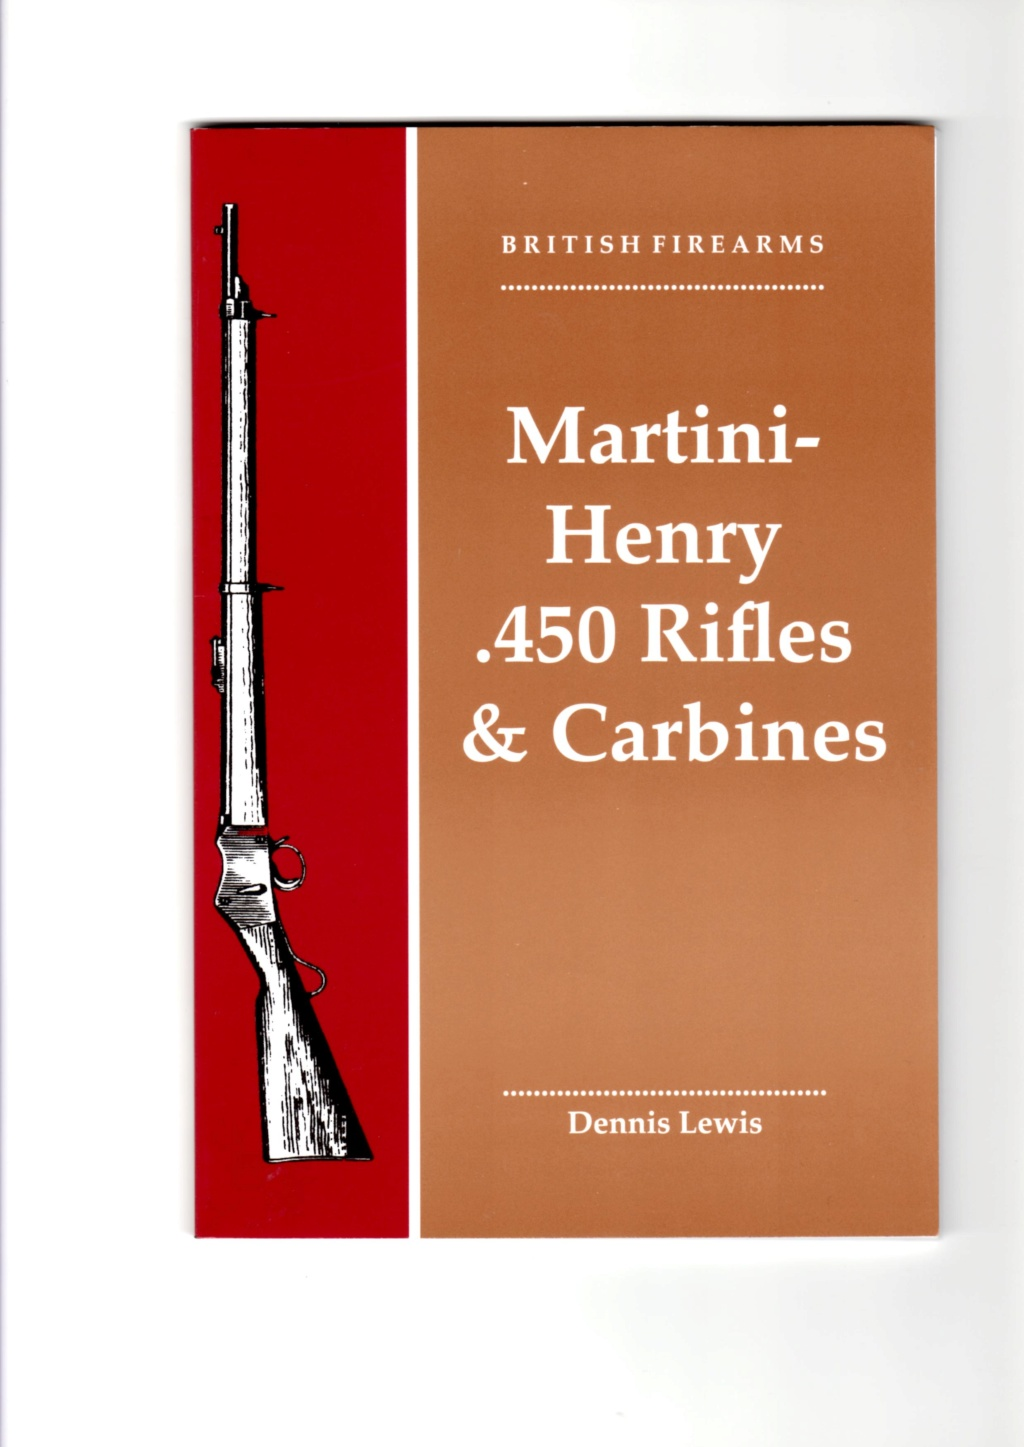 Martini-Henry .450 rifles & carbines Britis12